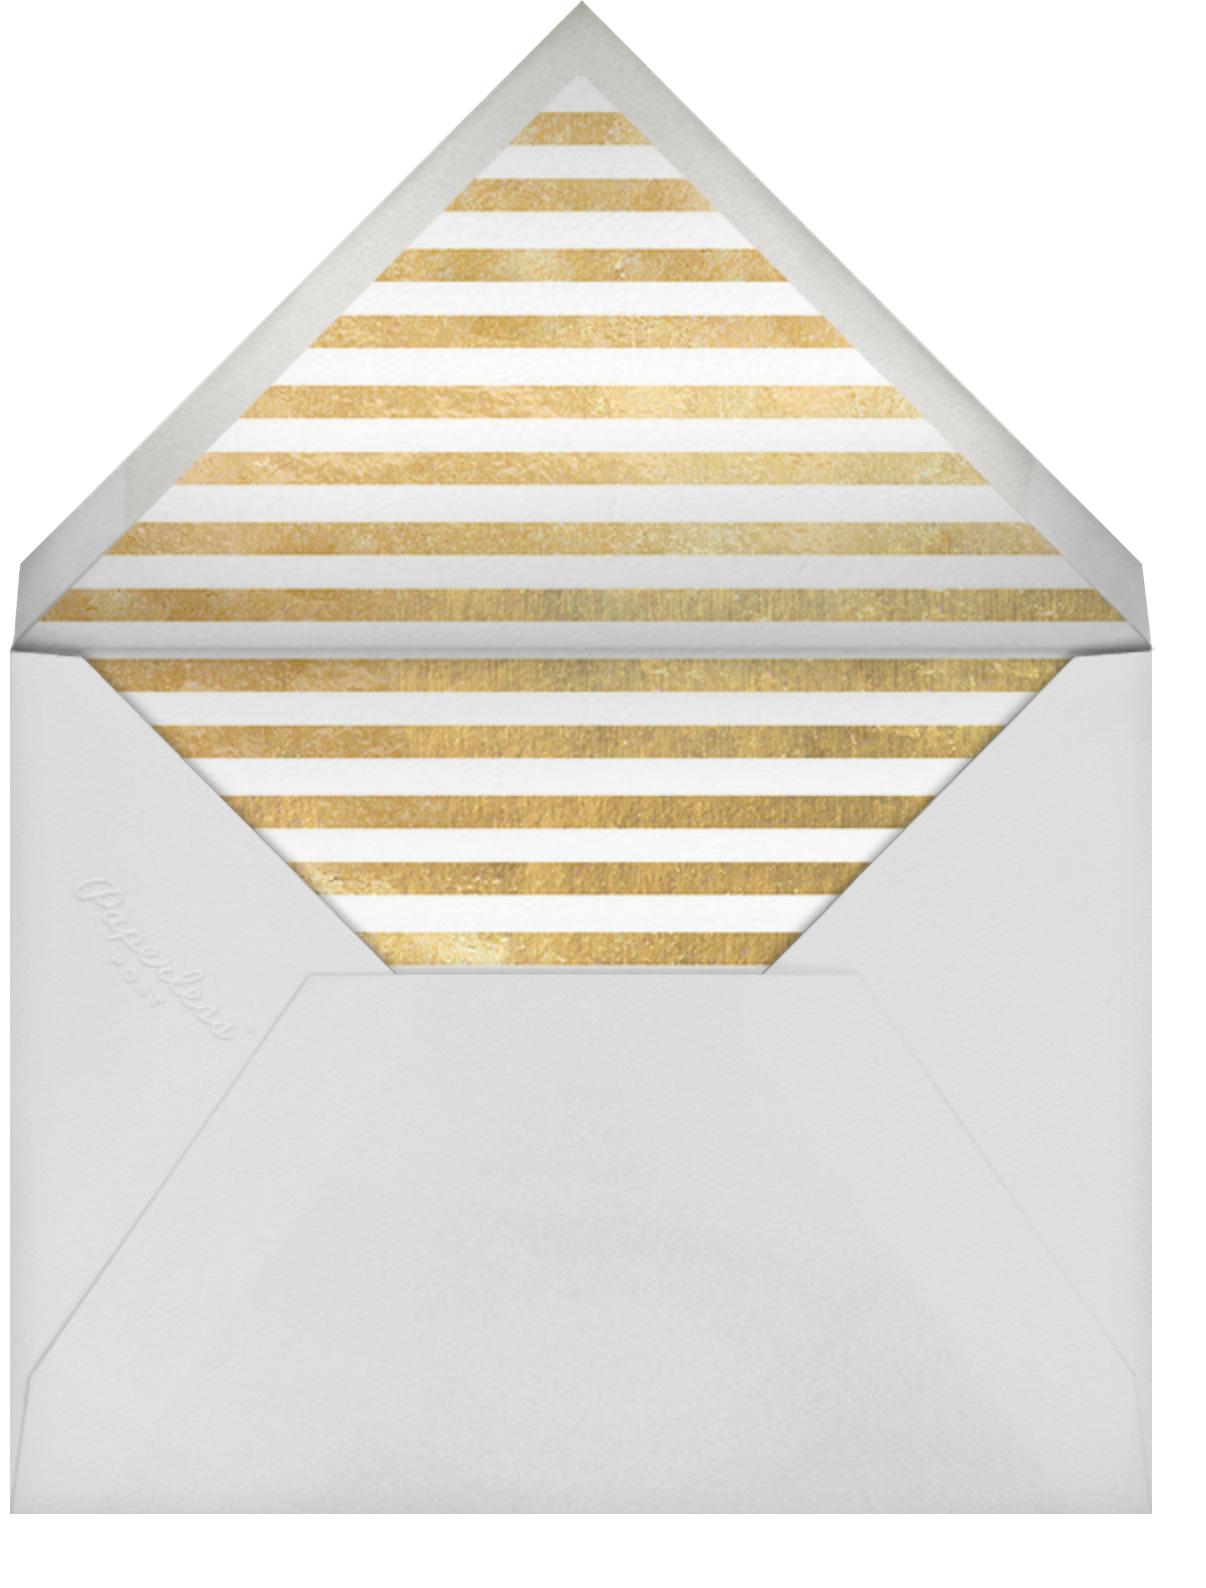 Confetti (Square) - Black - kate spade new york - New Year's Eve - envelope back